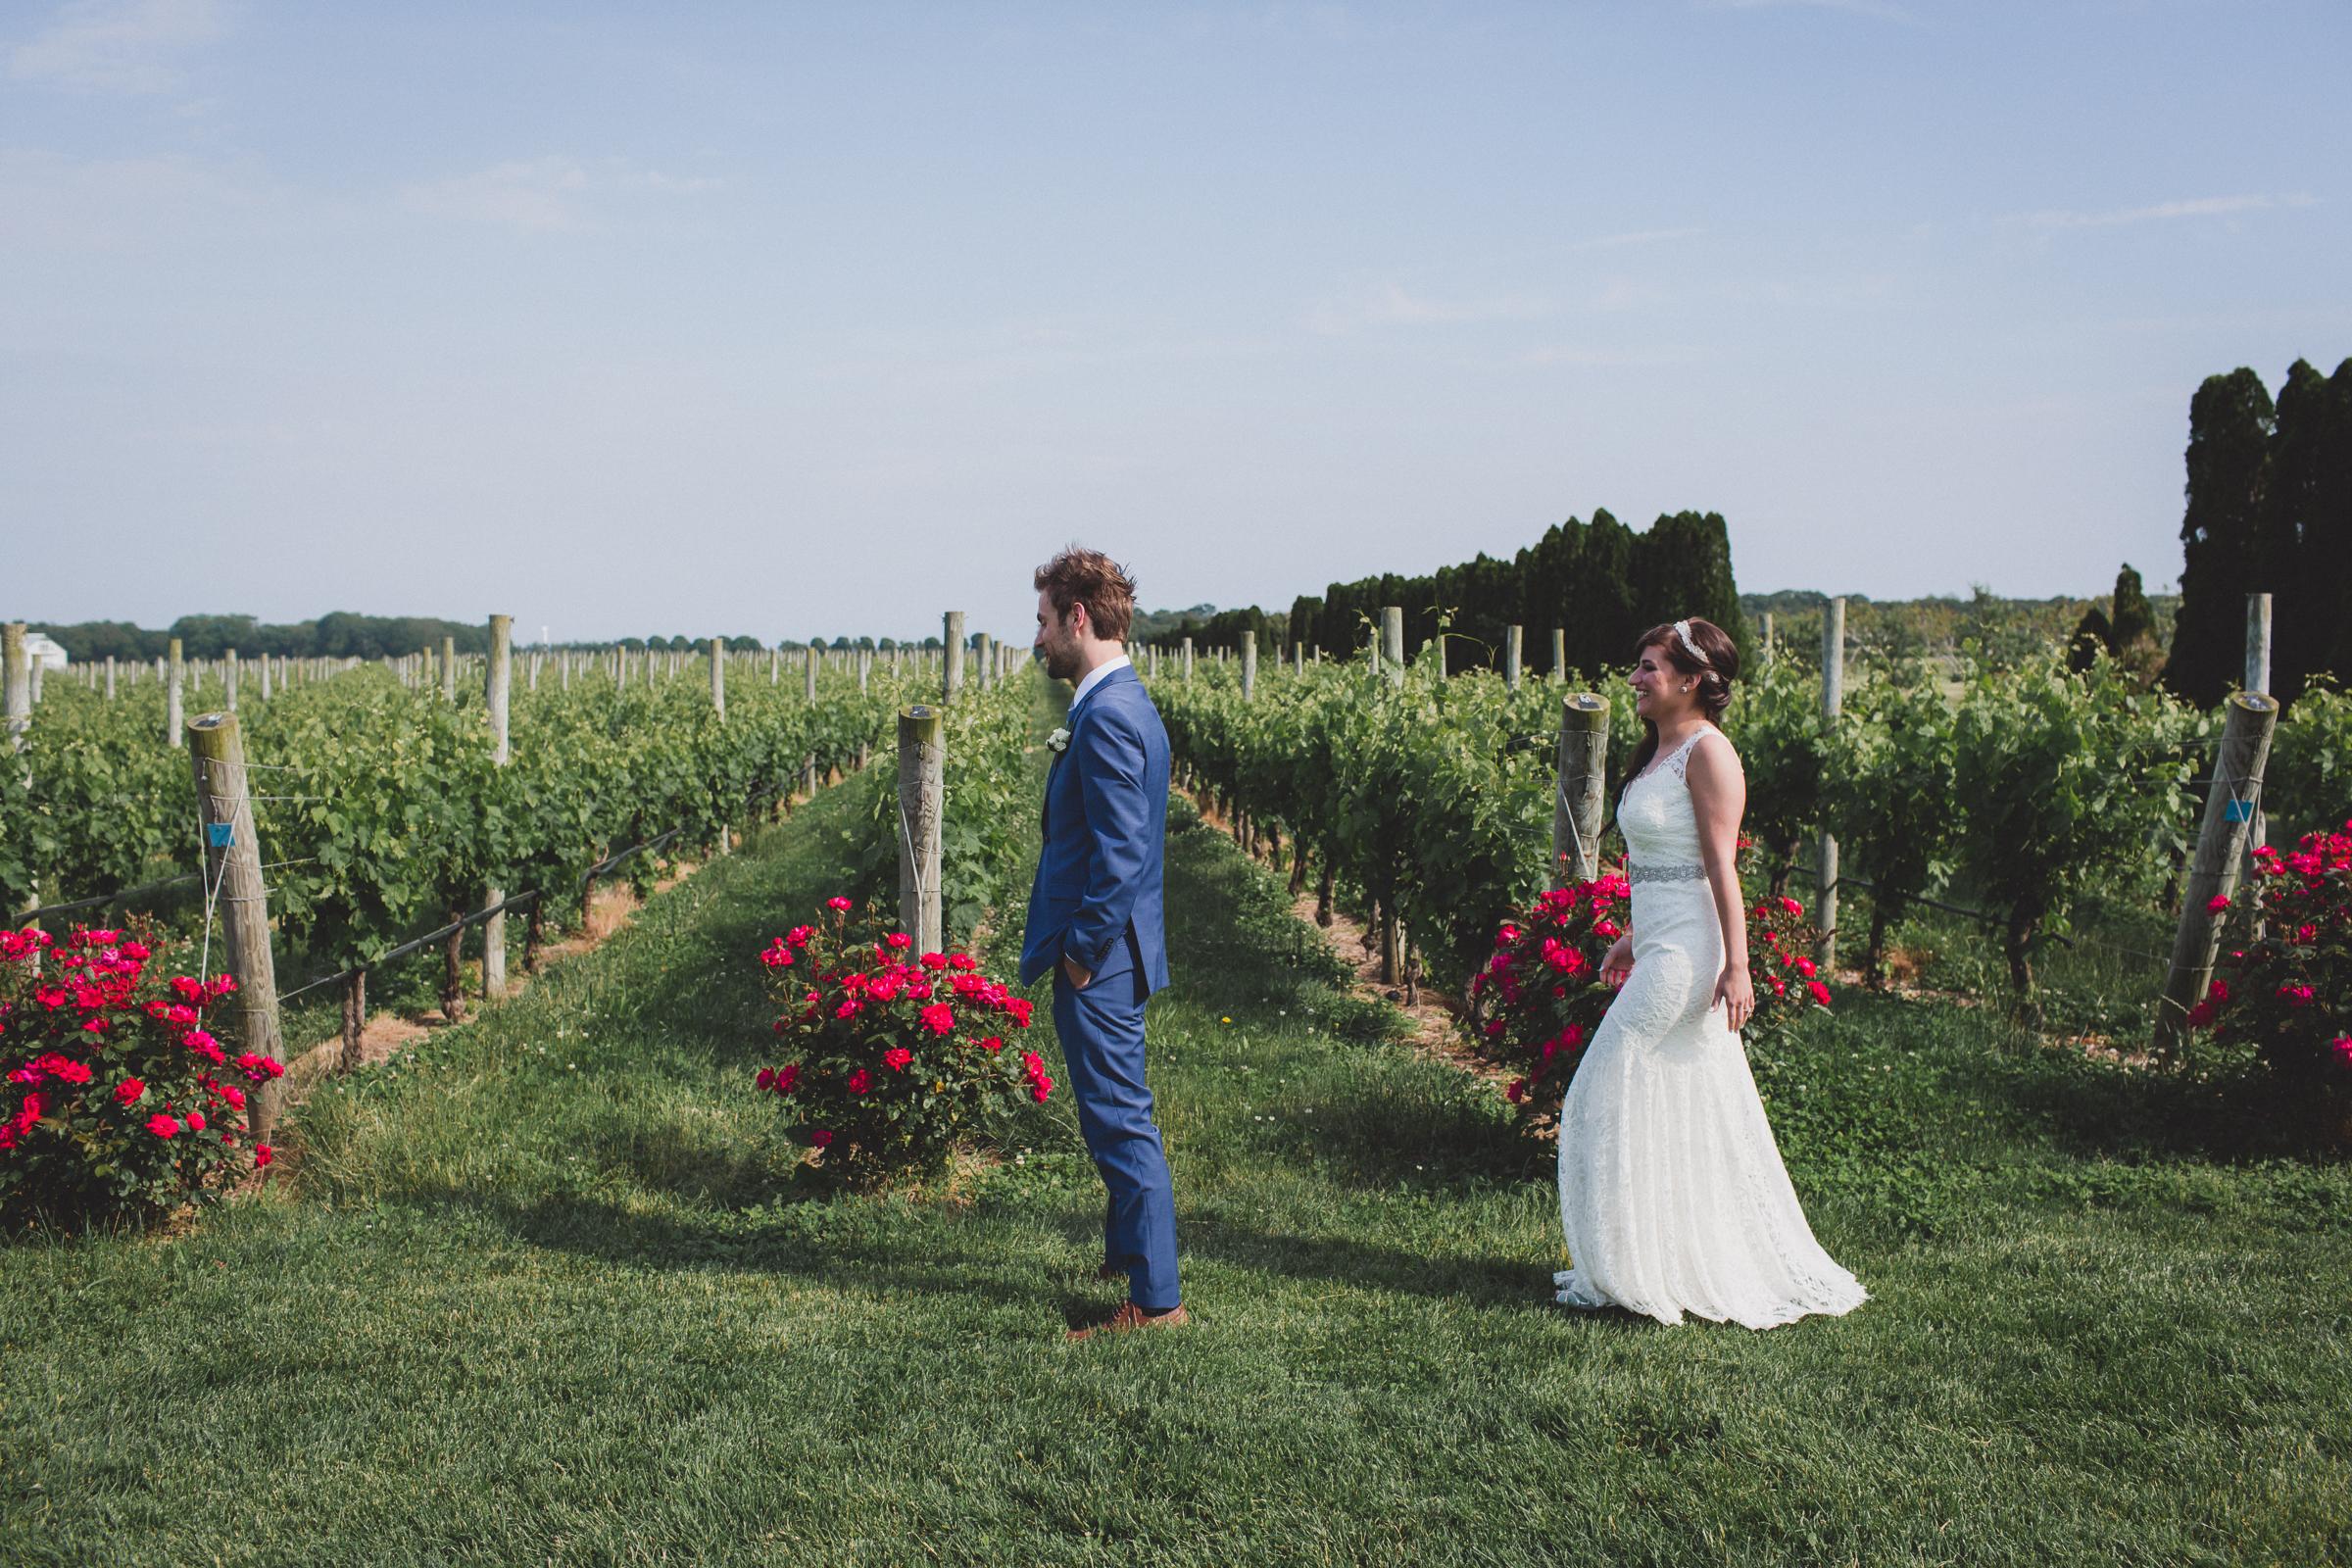 Martha-Clara-Vineyard-Long-Island-Documentary-Wedding-Photographer-24.jpg